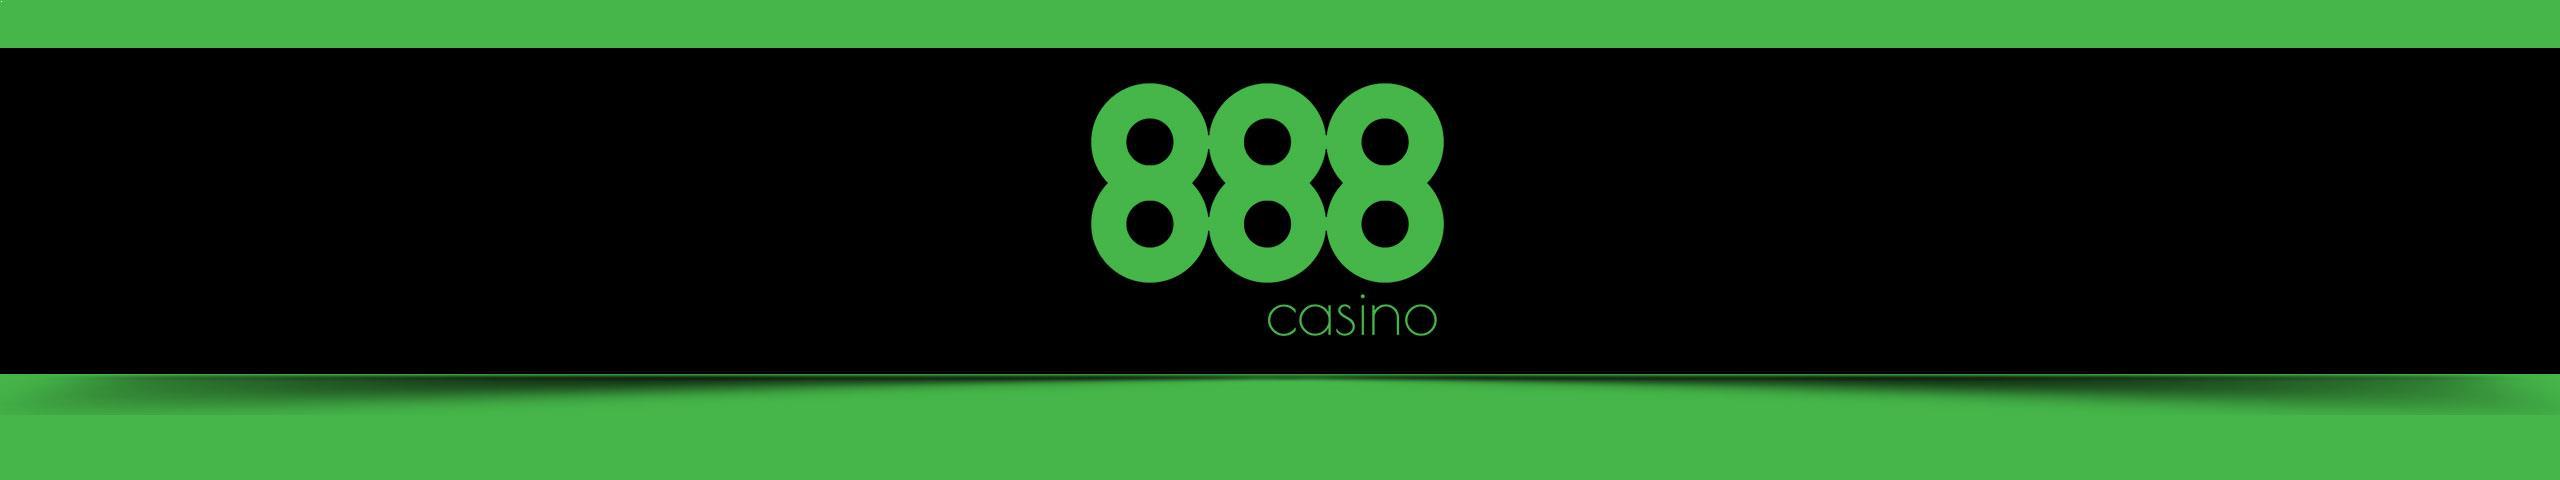 888 Casino Vizualizarea Casino-ului Casino Multa Bafta Slider